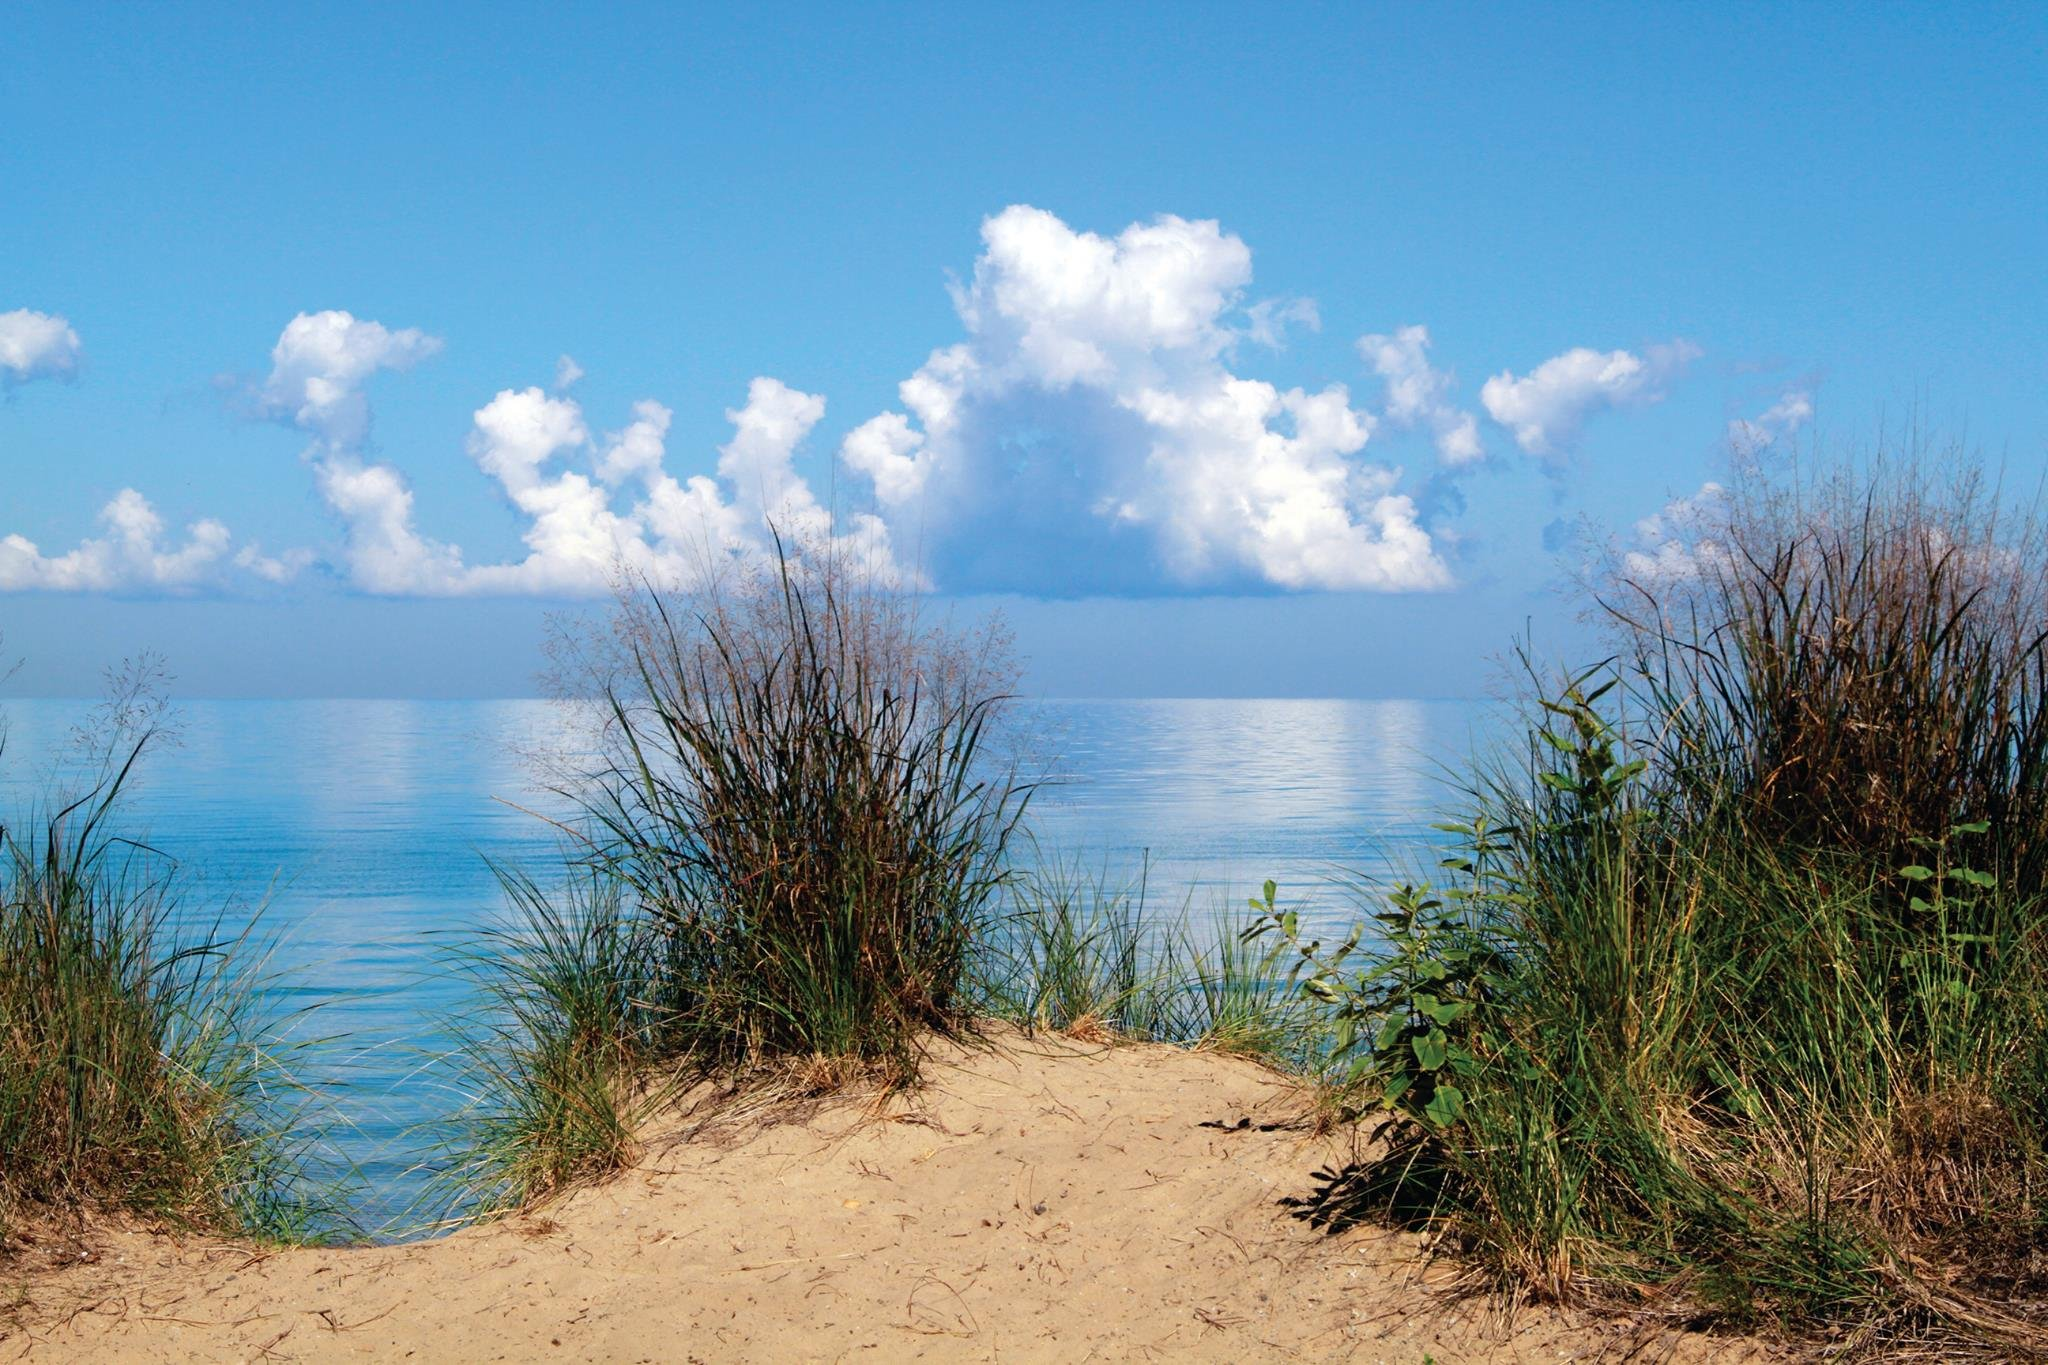 Source: Indiana Dunes National Lakeshore